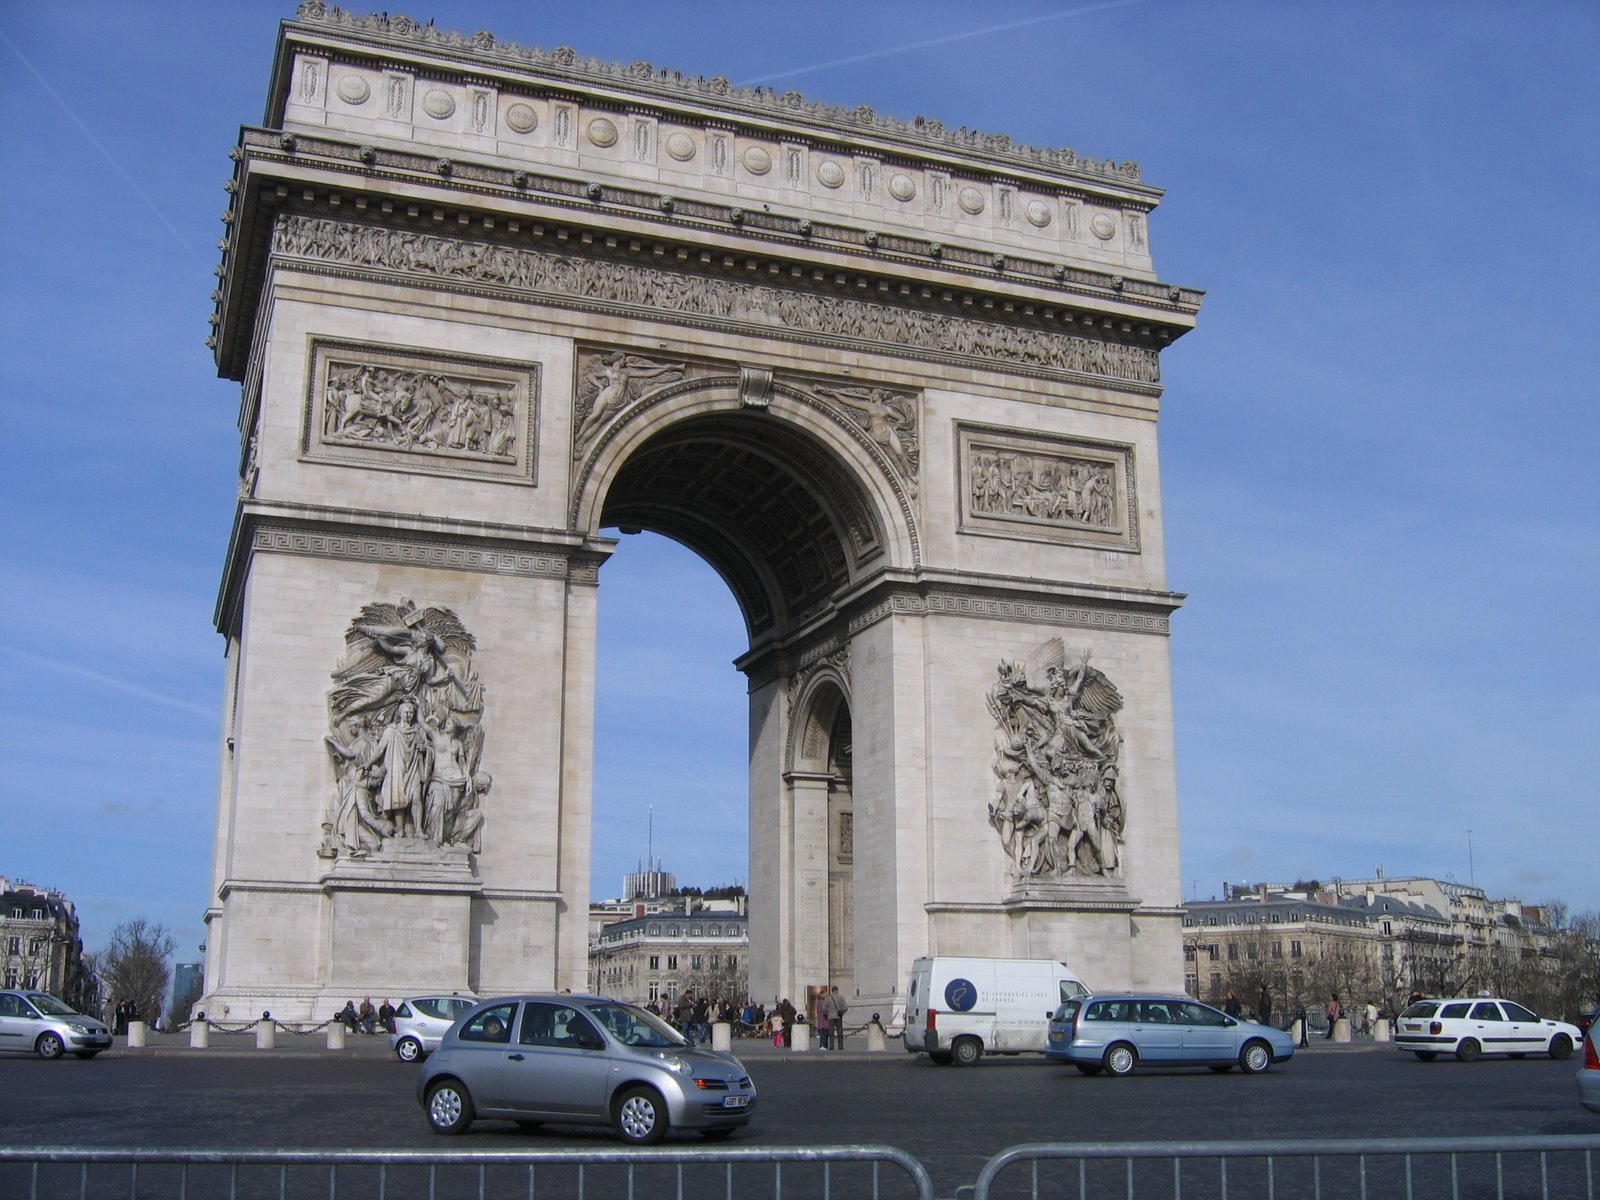 Arc de Triomphe - http://en.wikipedia.org/wiki/Arc_de_Triomphe